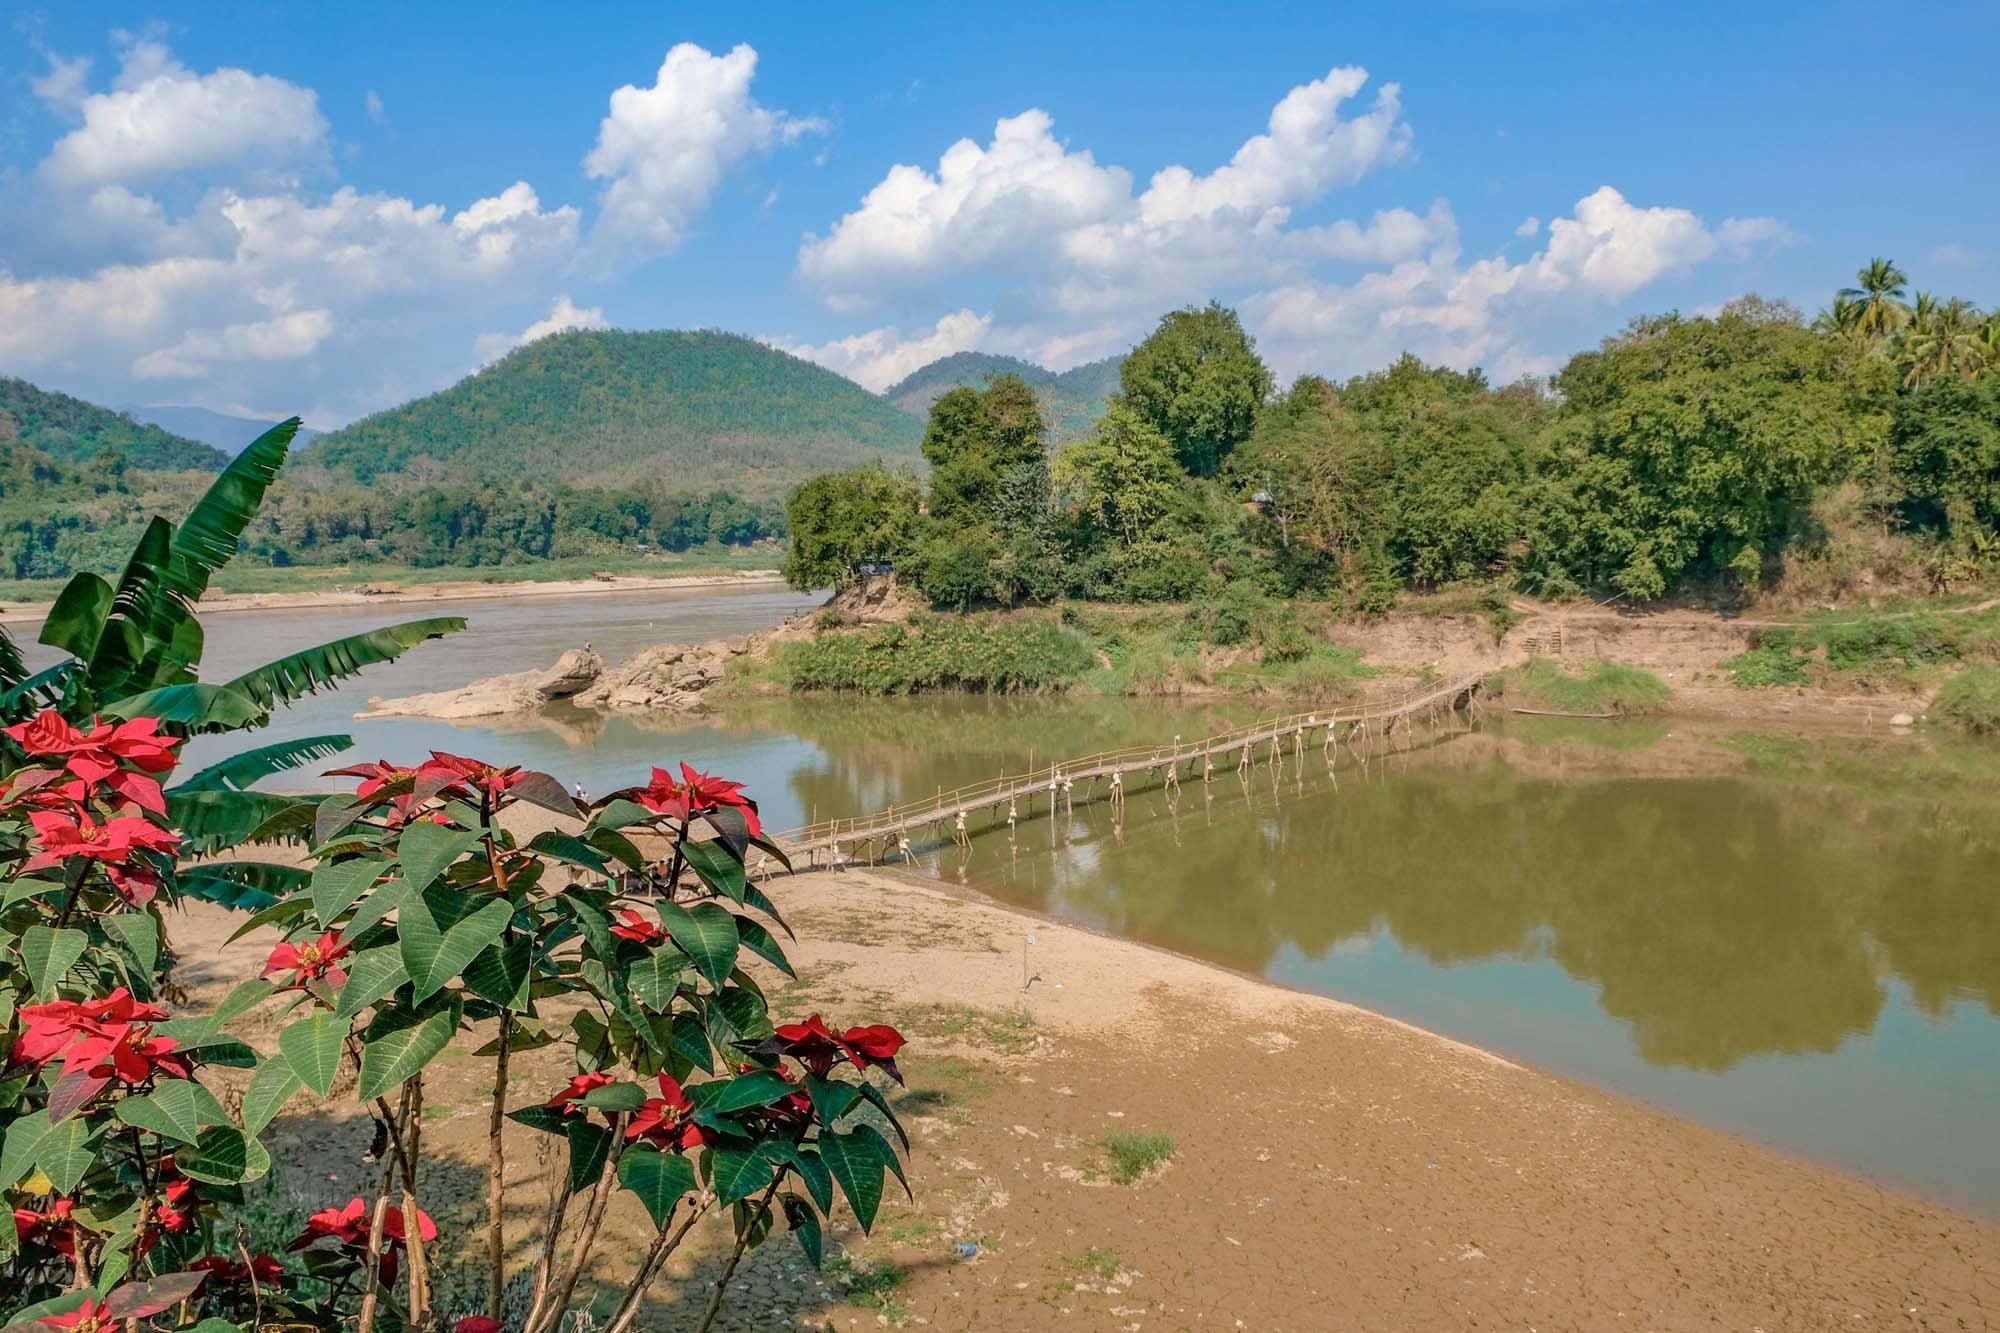 mekong delta in luang prabang